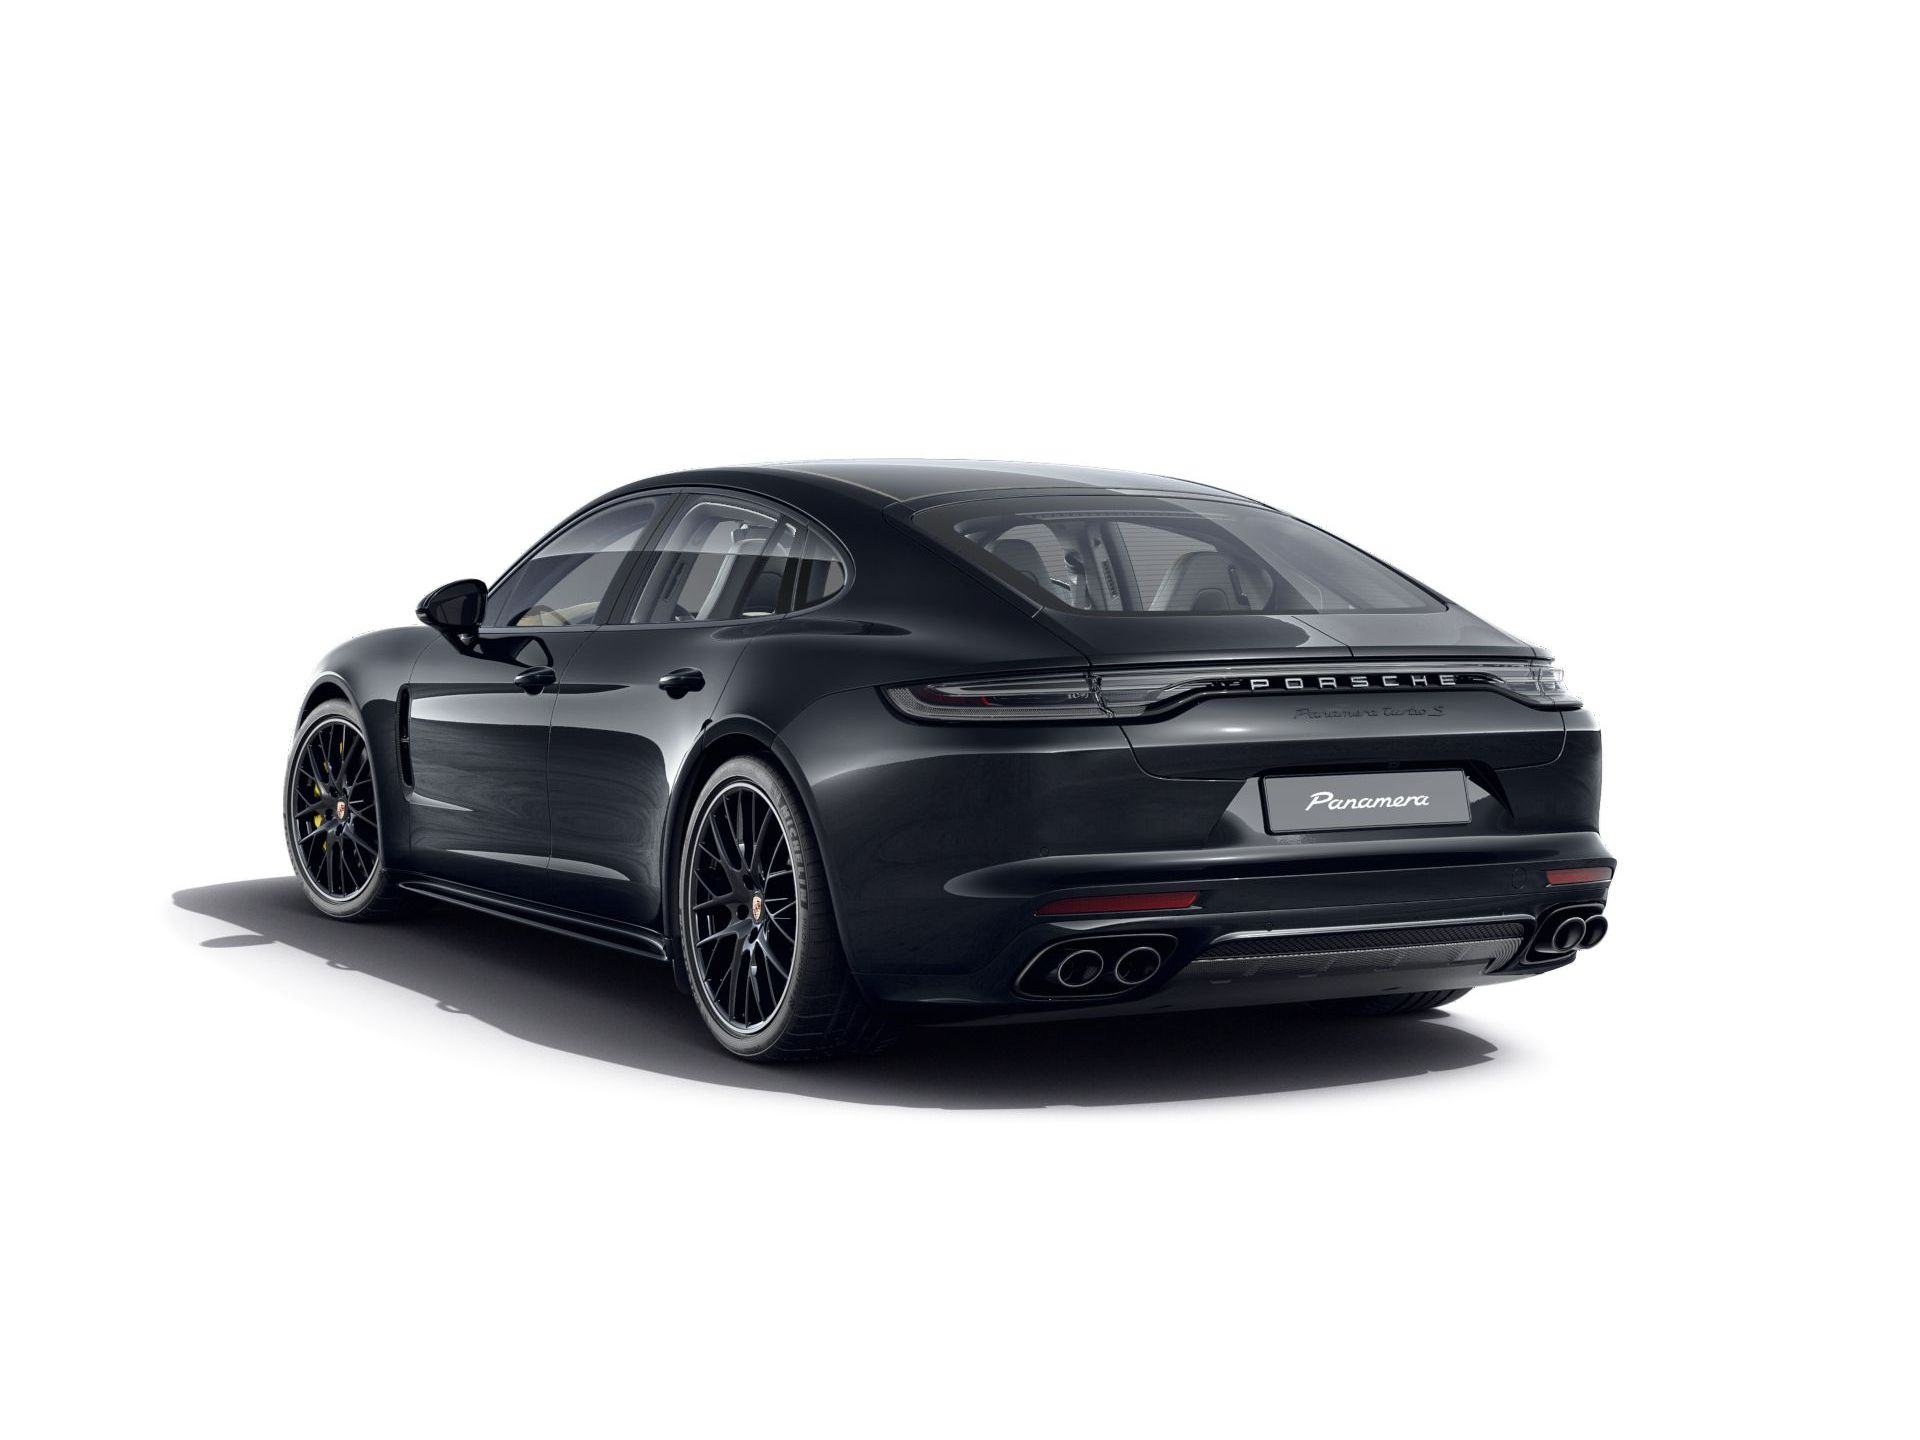 2022 Porsche Panamera Turbo S – 3